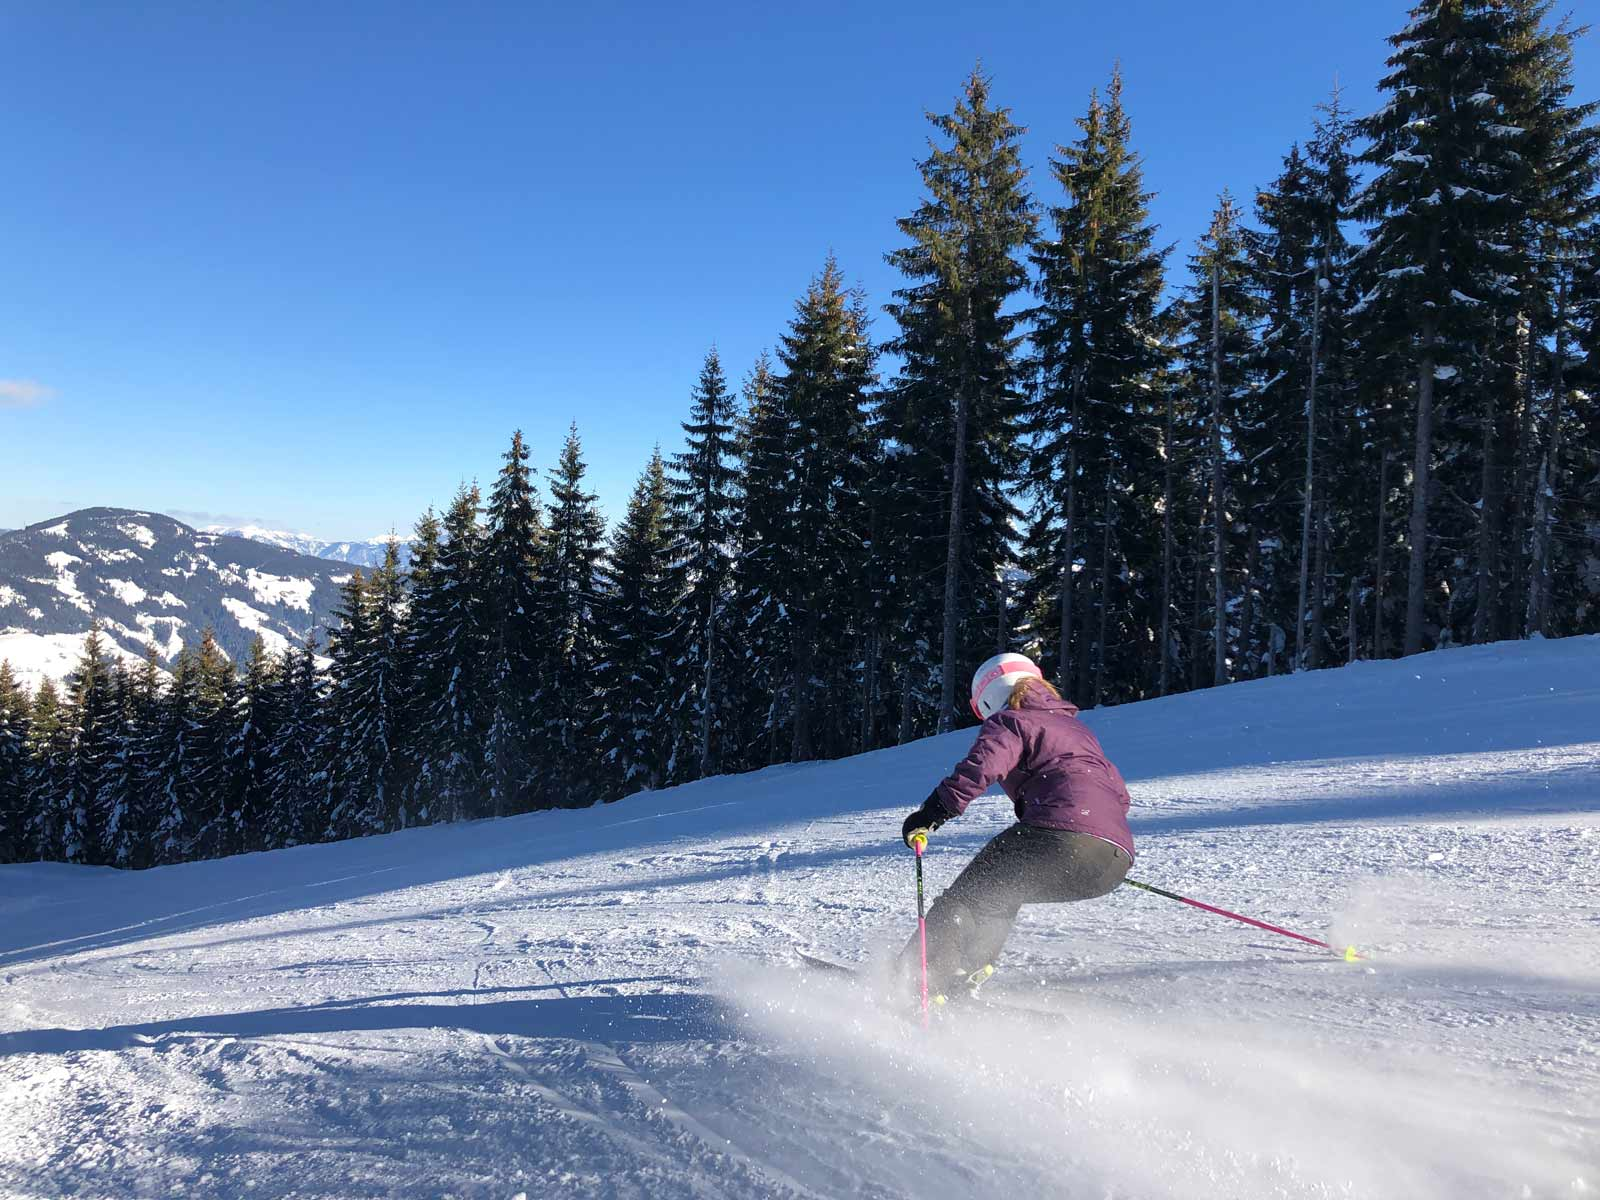 SkiWelt-Tour skiën